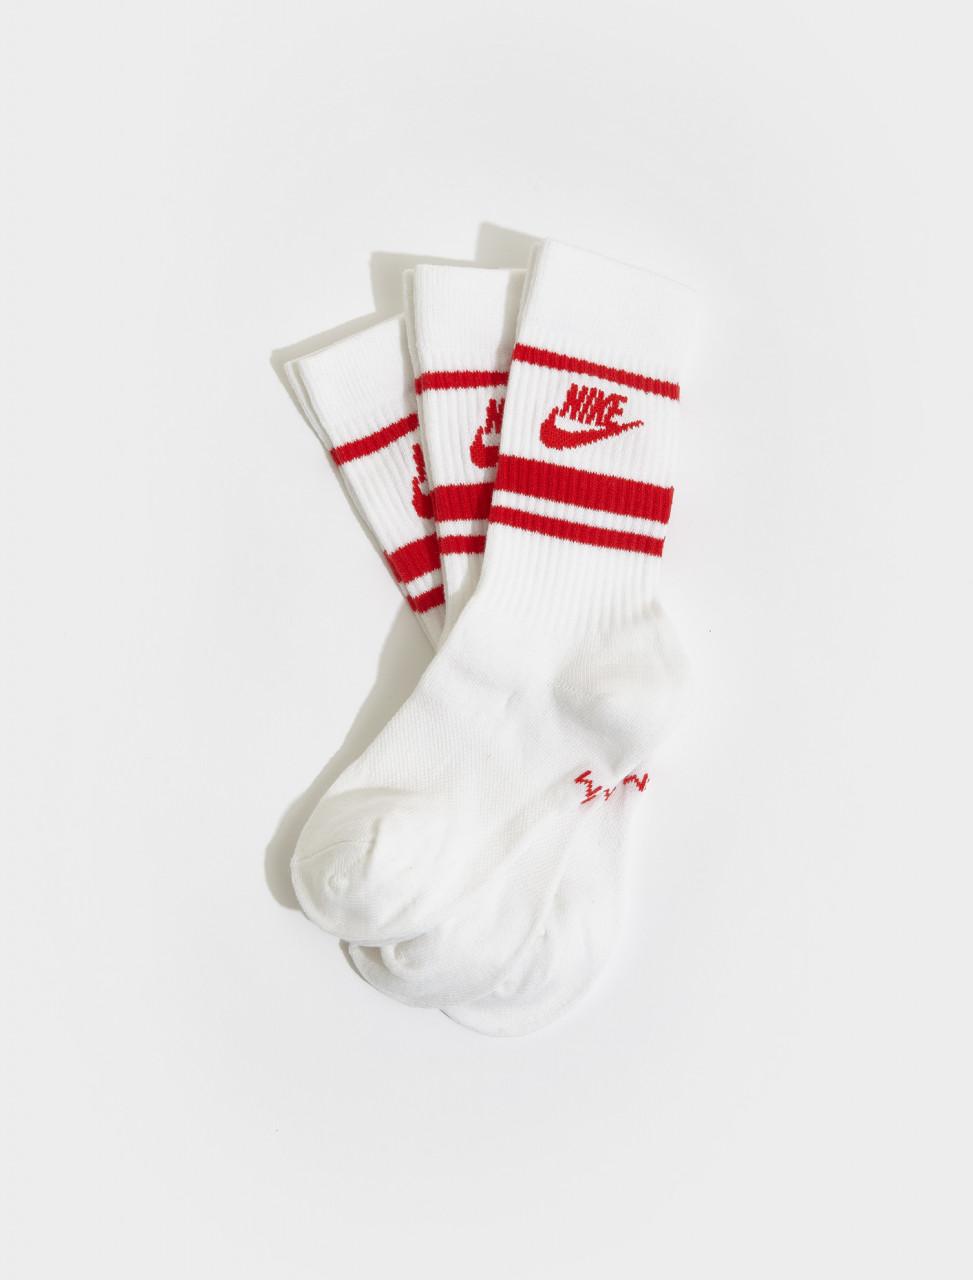 CQ0301-102 NIKE LOGO RED SOCKS WHITE